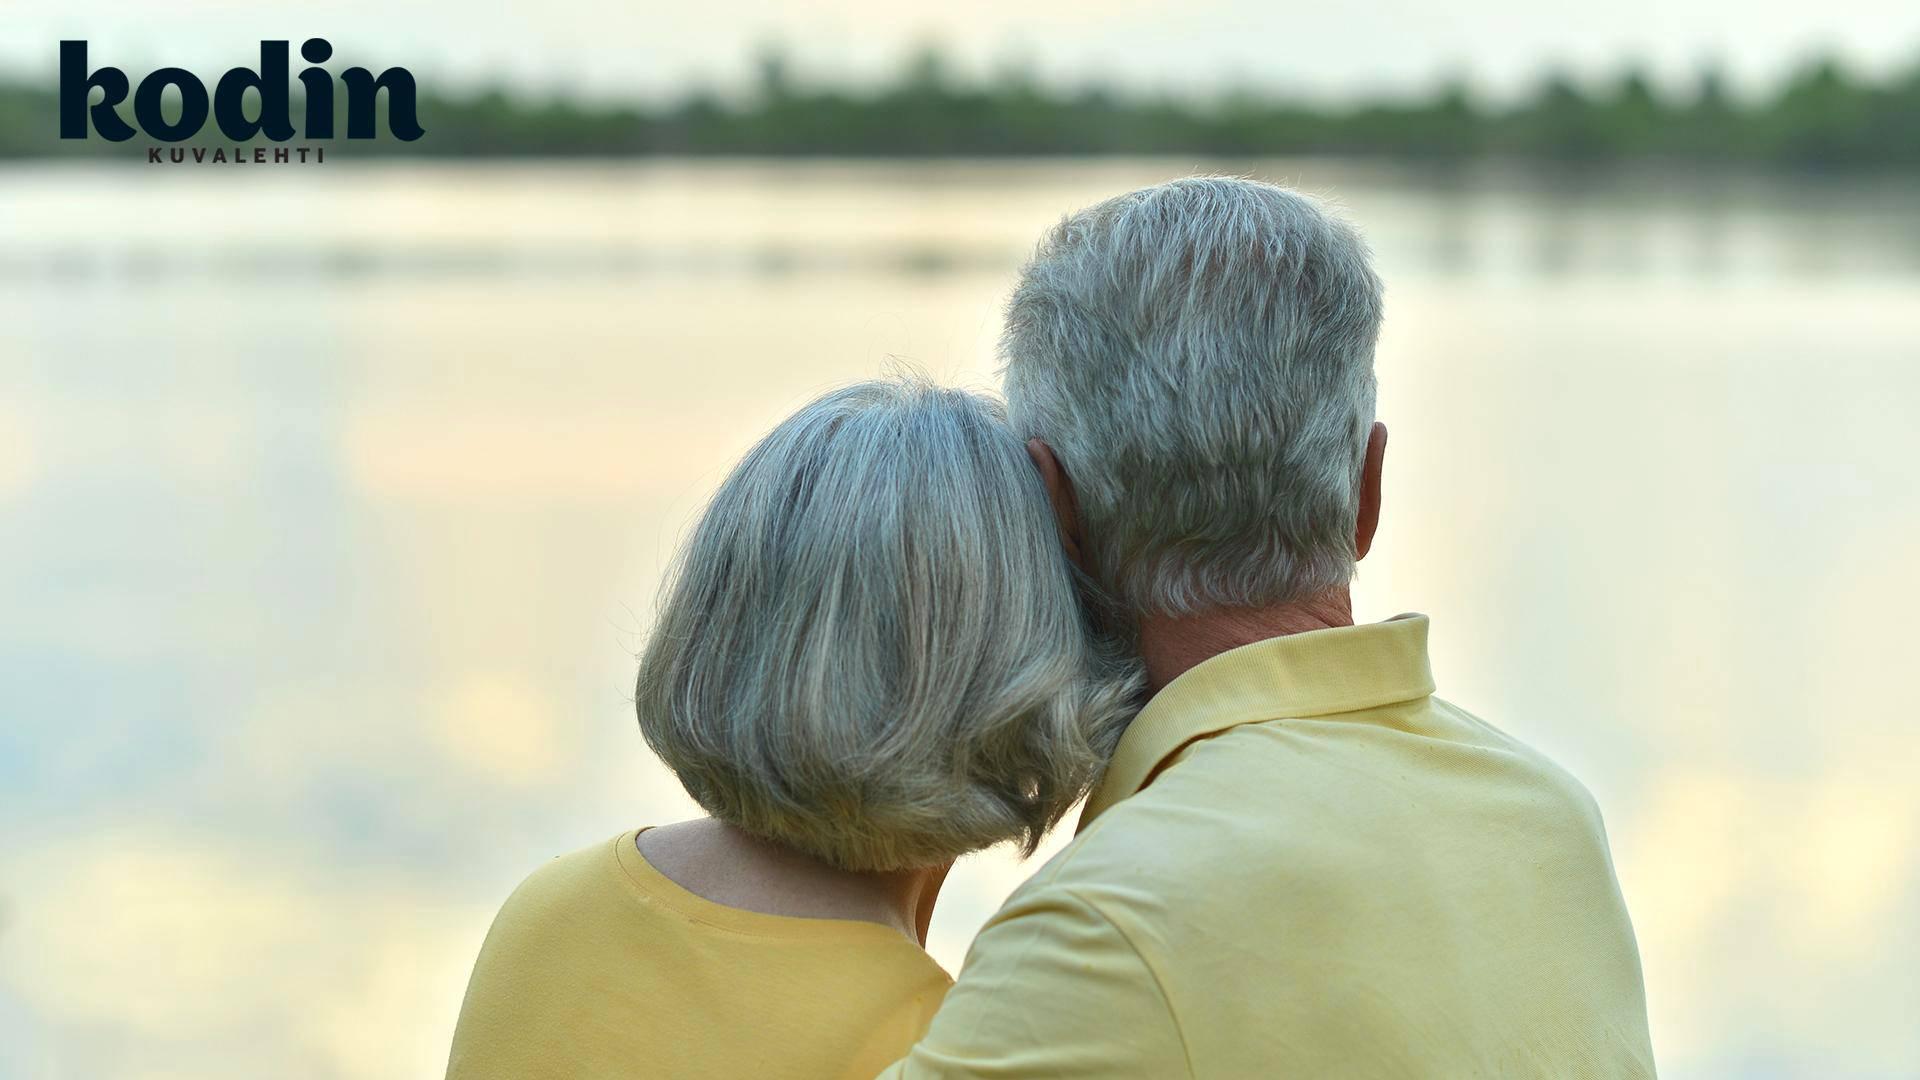 35 vuotta vanha mies dating 21-vuotias nainen